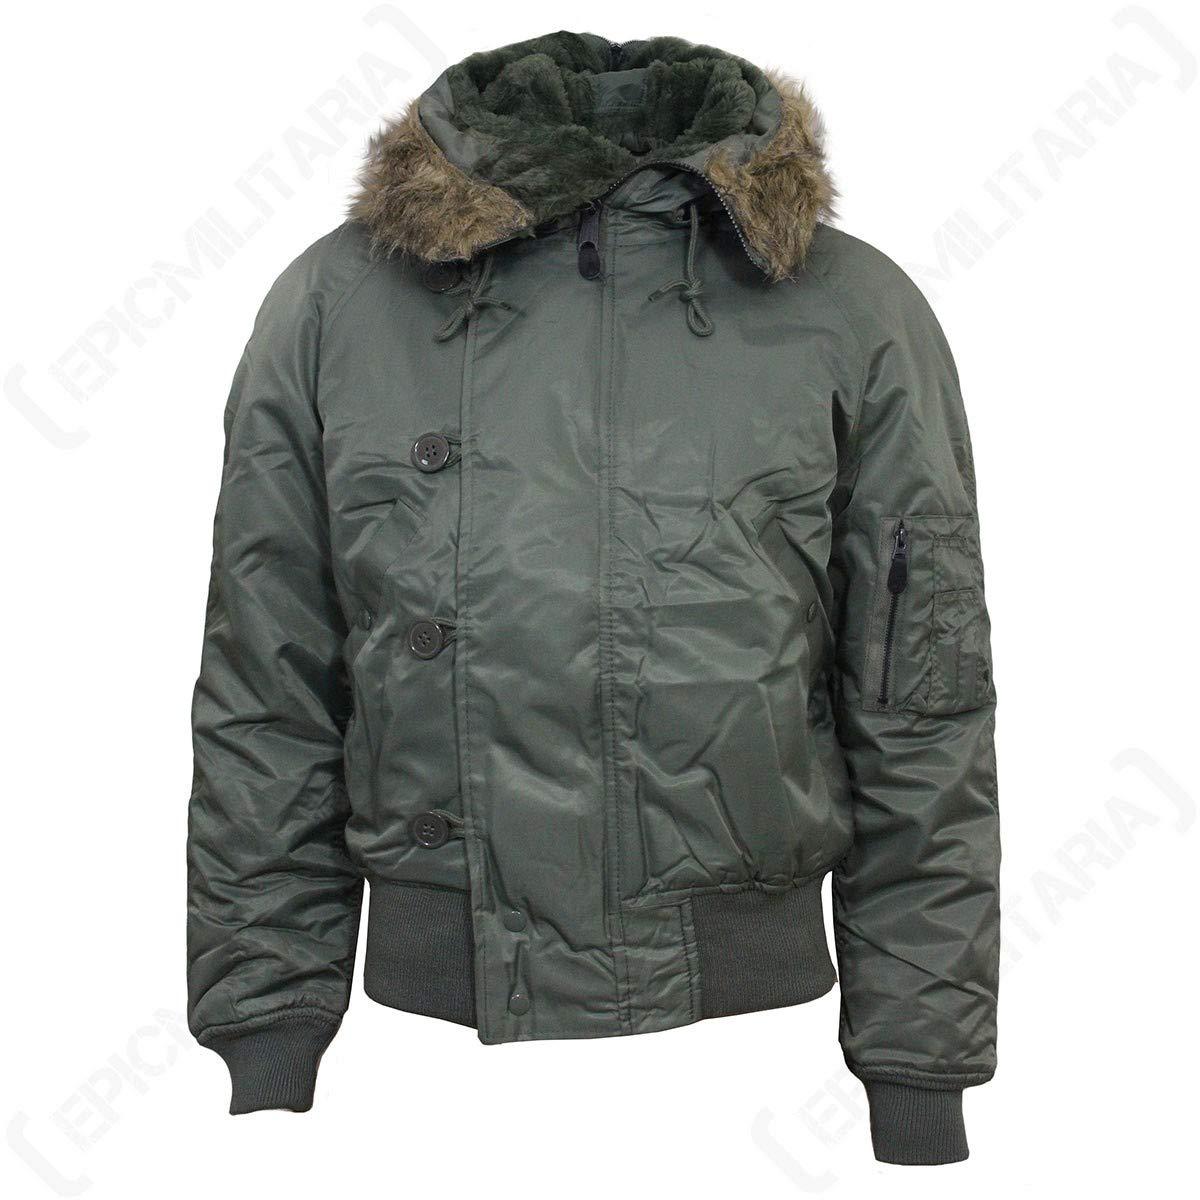 Mil-Tec N2B Flight Jacket Olive size XL by CamoOutdoor